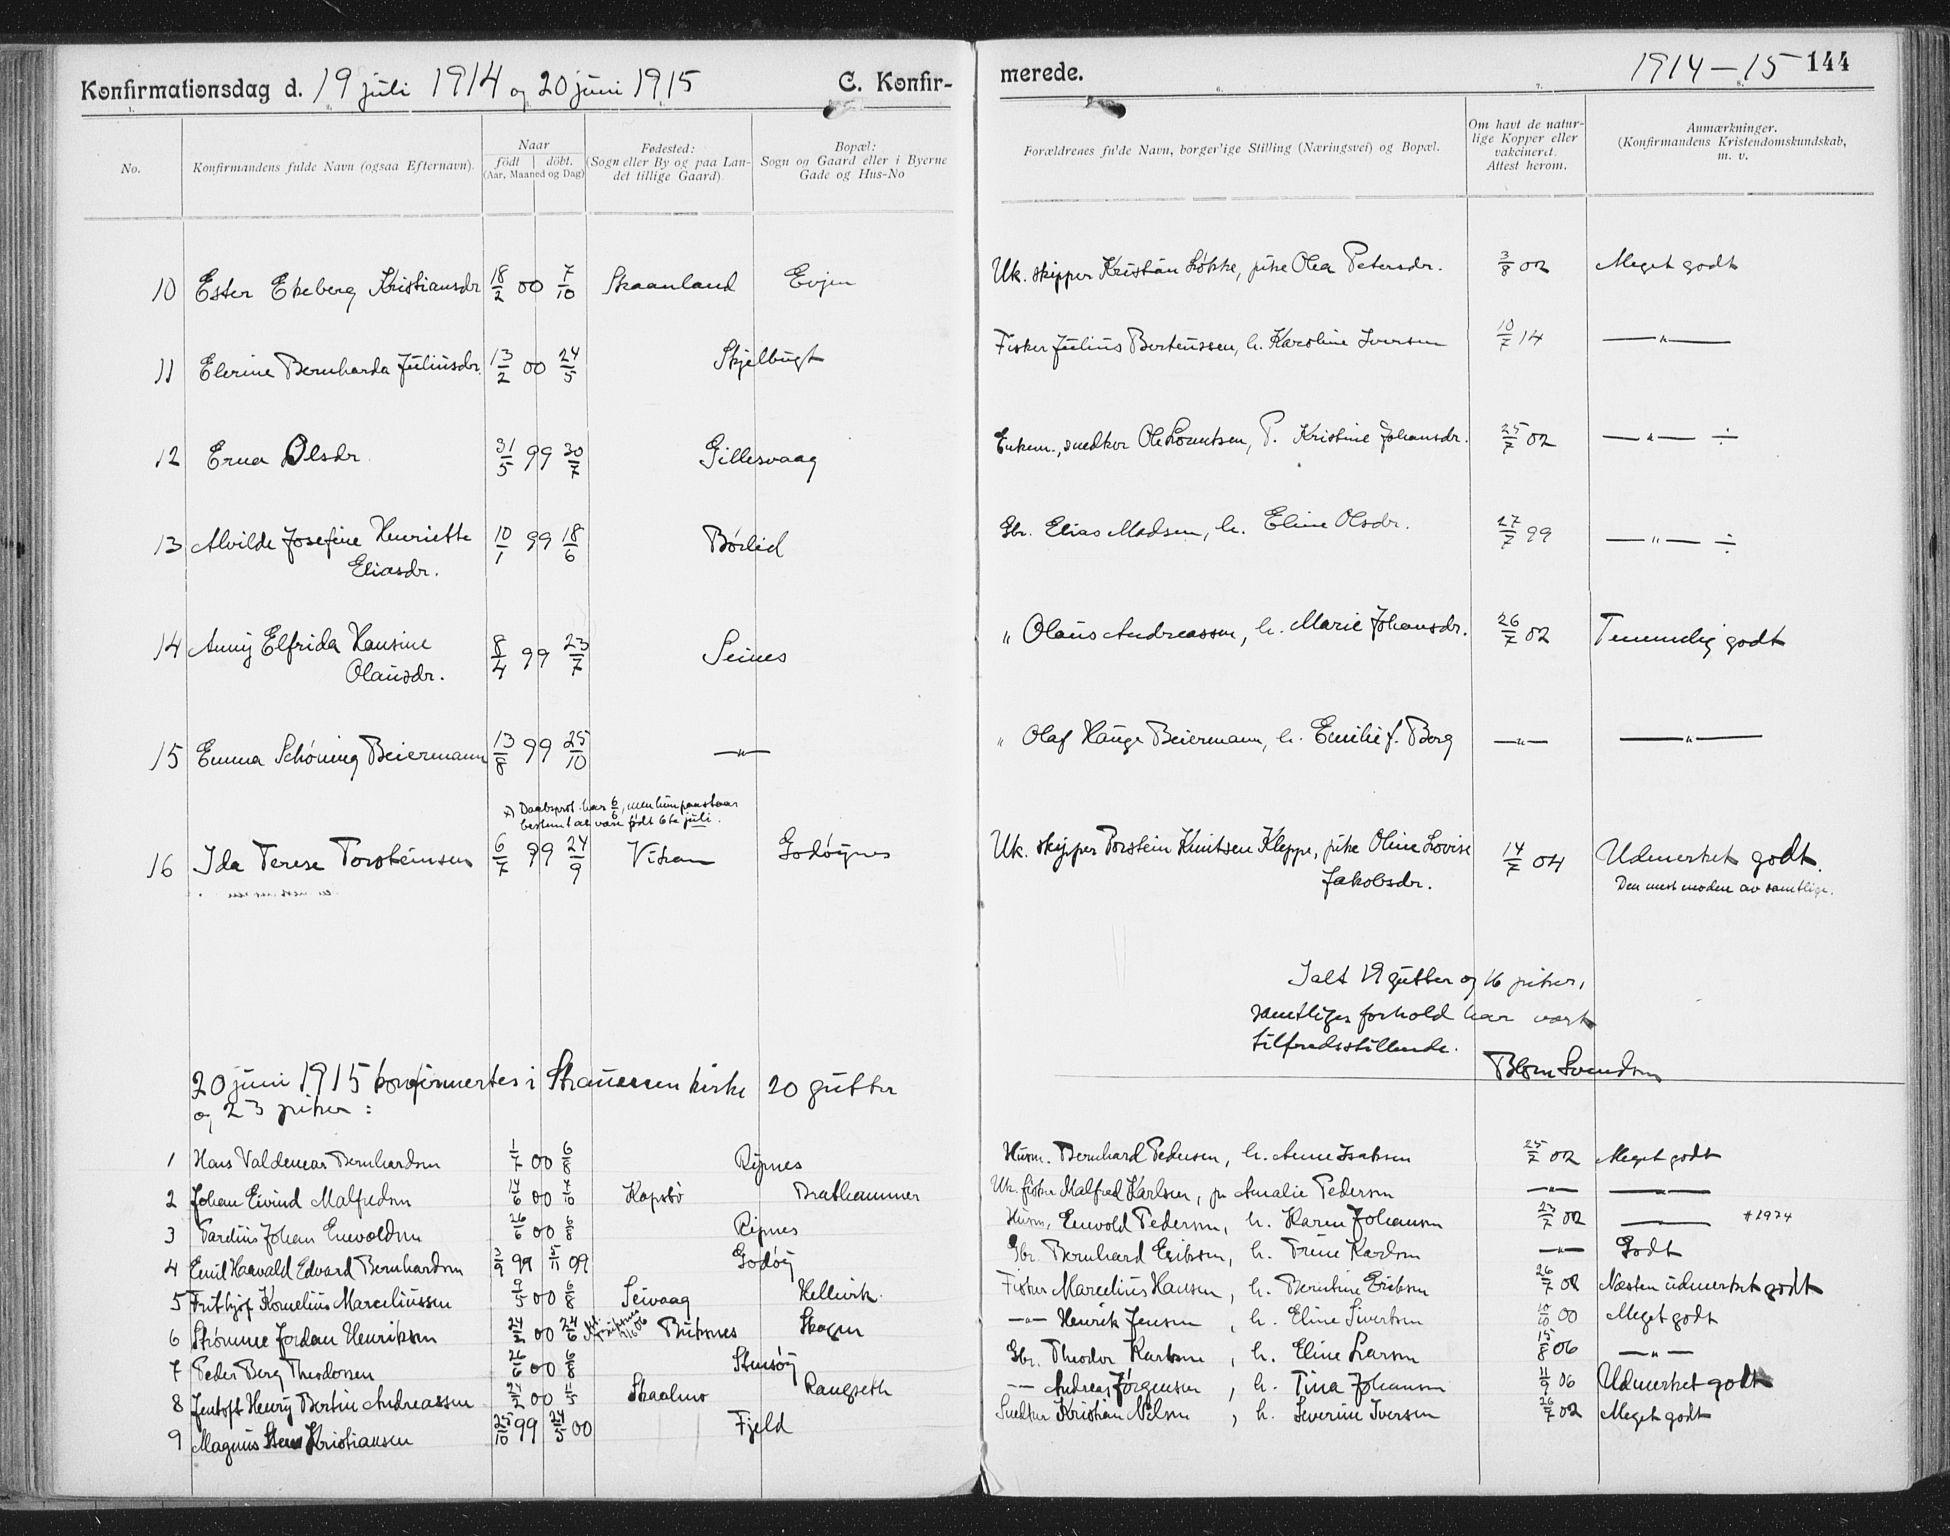 SAT, Ministerialprotokoller, klokkerbøker og fødselsregistre - Nordland, 804/L0081: Ministerialbok nr. 804A02, 1901-1915, s. 144